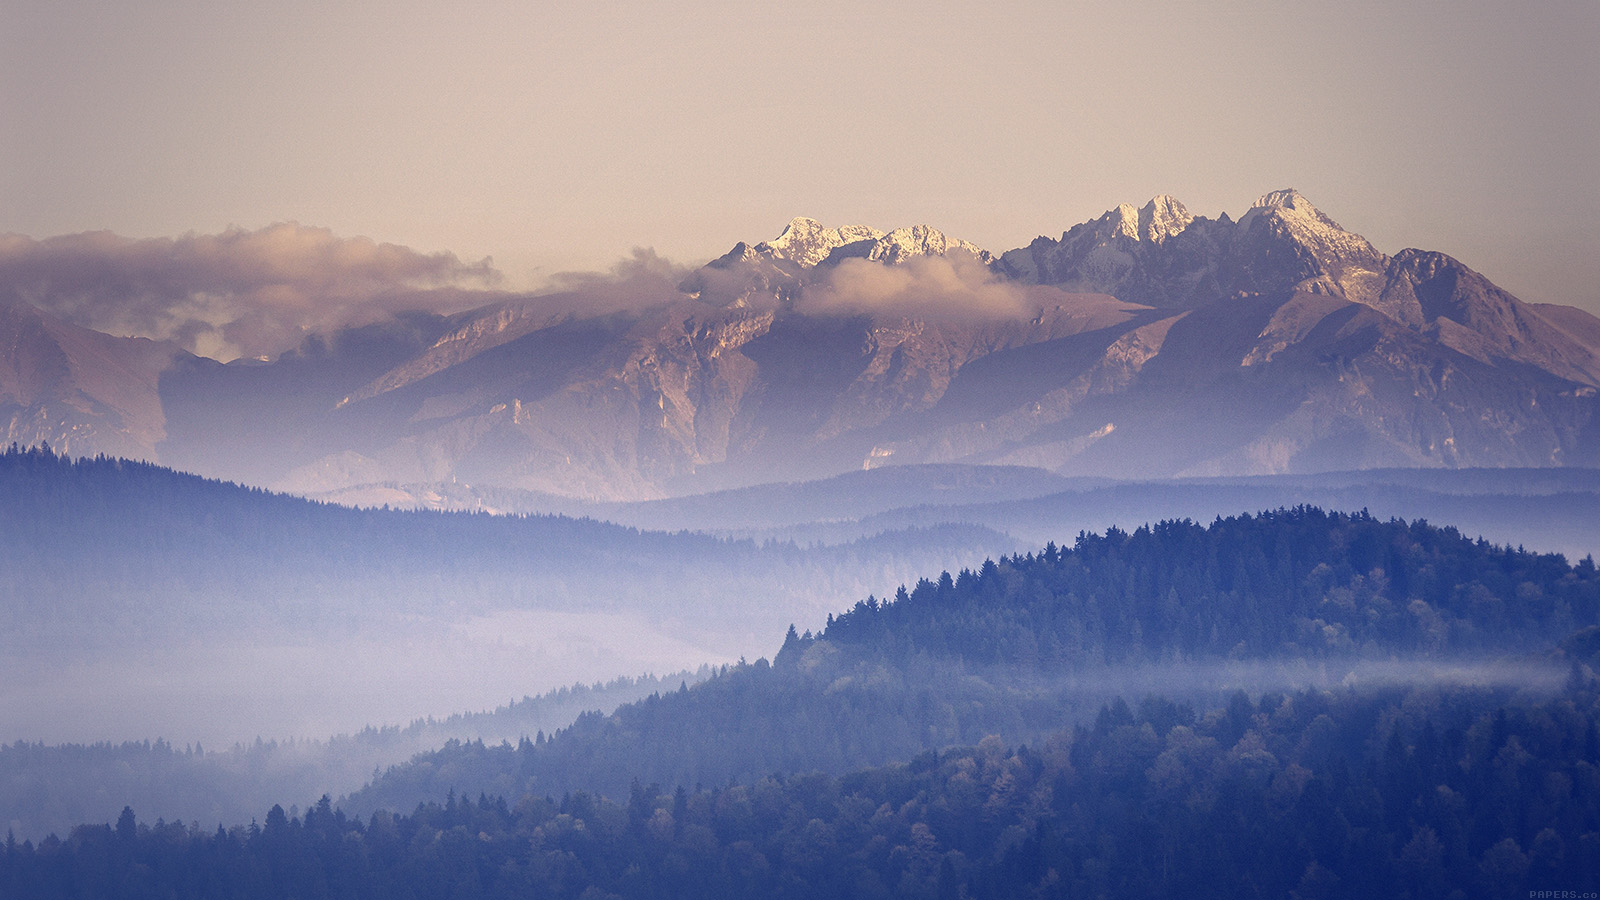 Batman Iphone 7 Wallpaper Mo13 Mountain Peace Blue Sky Nature Papers Co